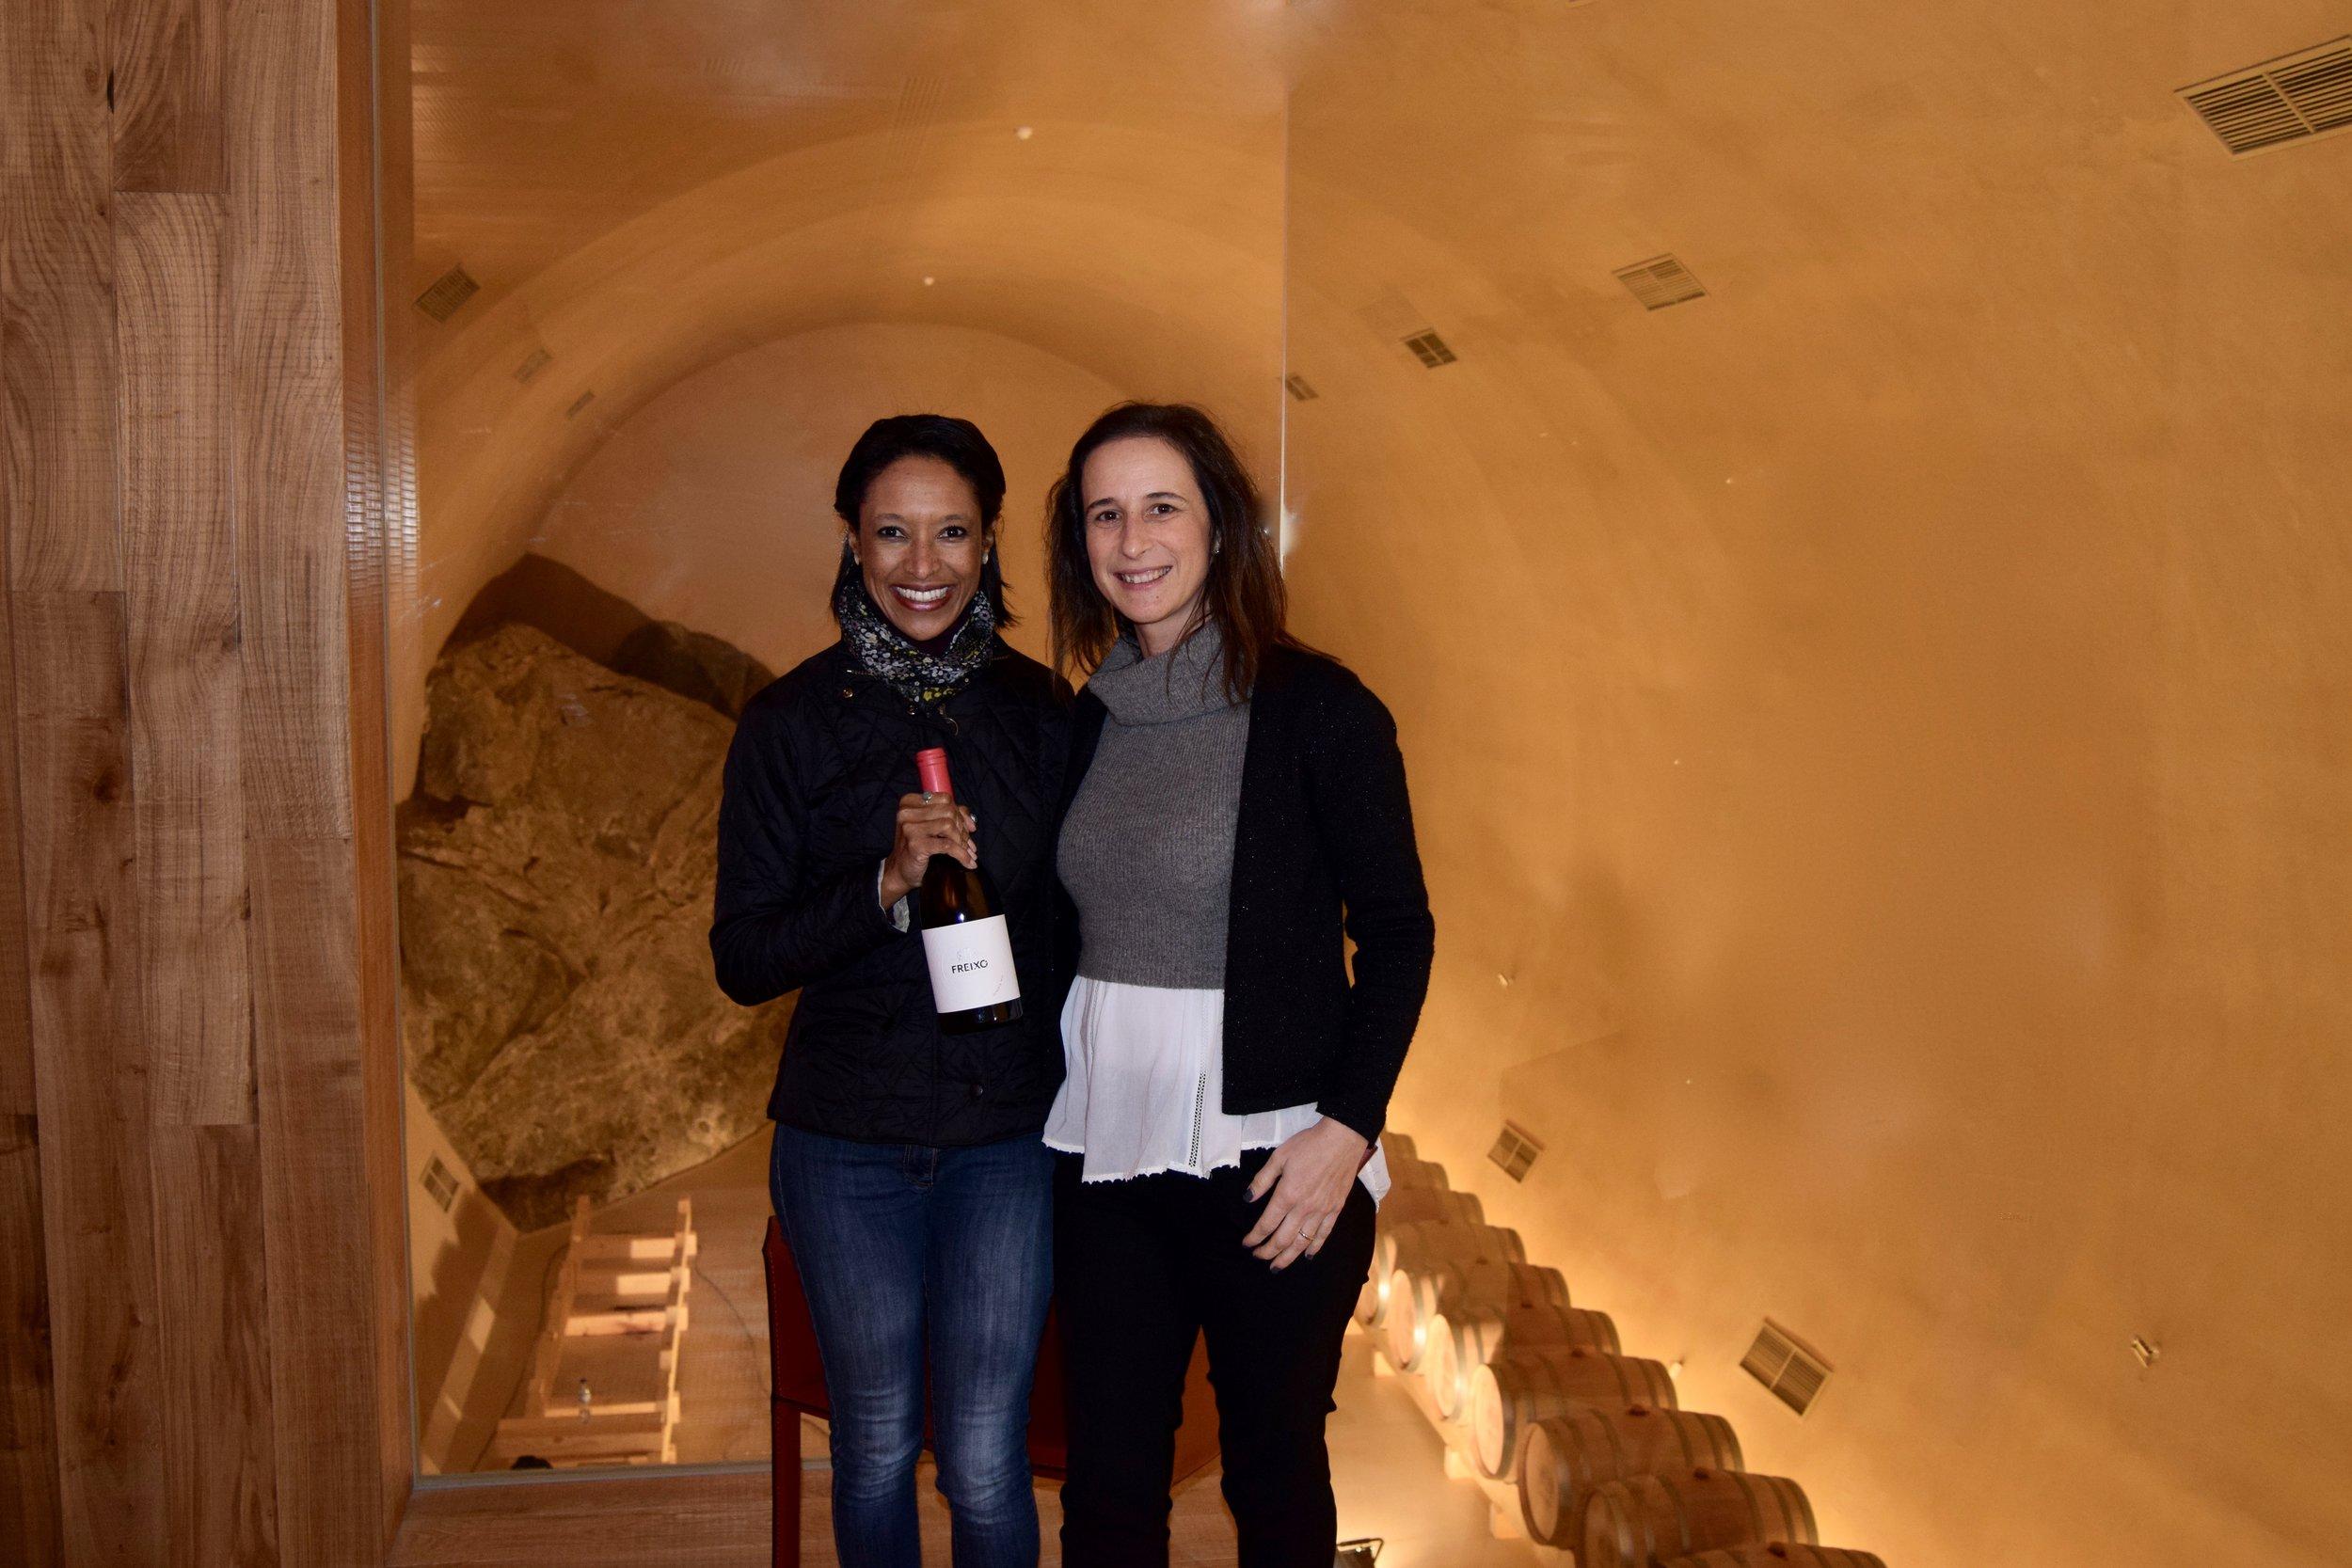 40 meters (131 ft) underground with herdade de freixo's marketing director carolina tome